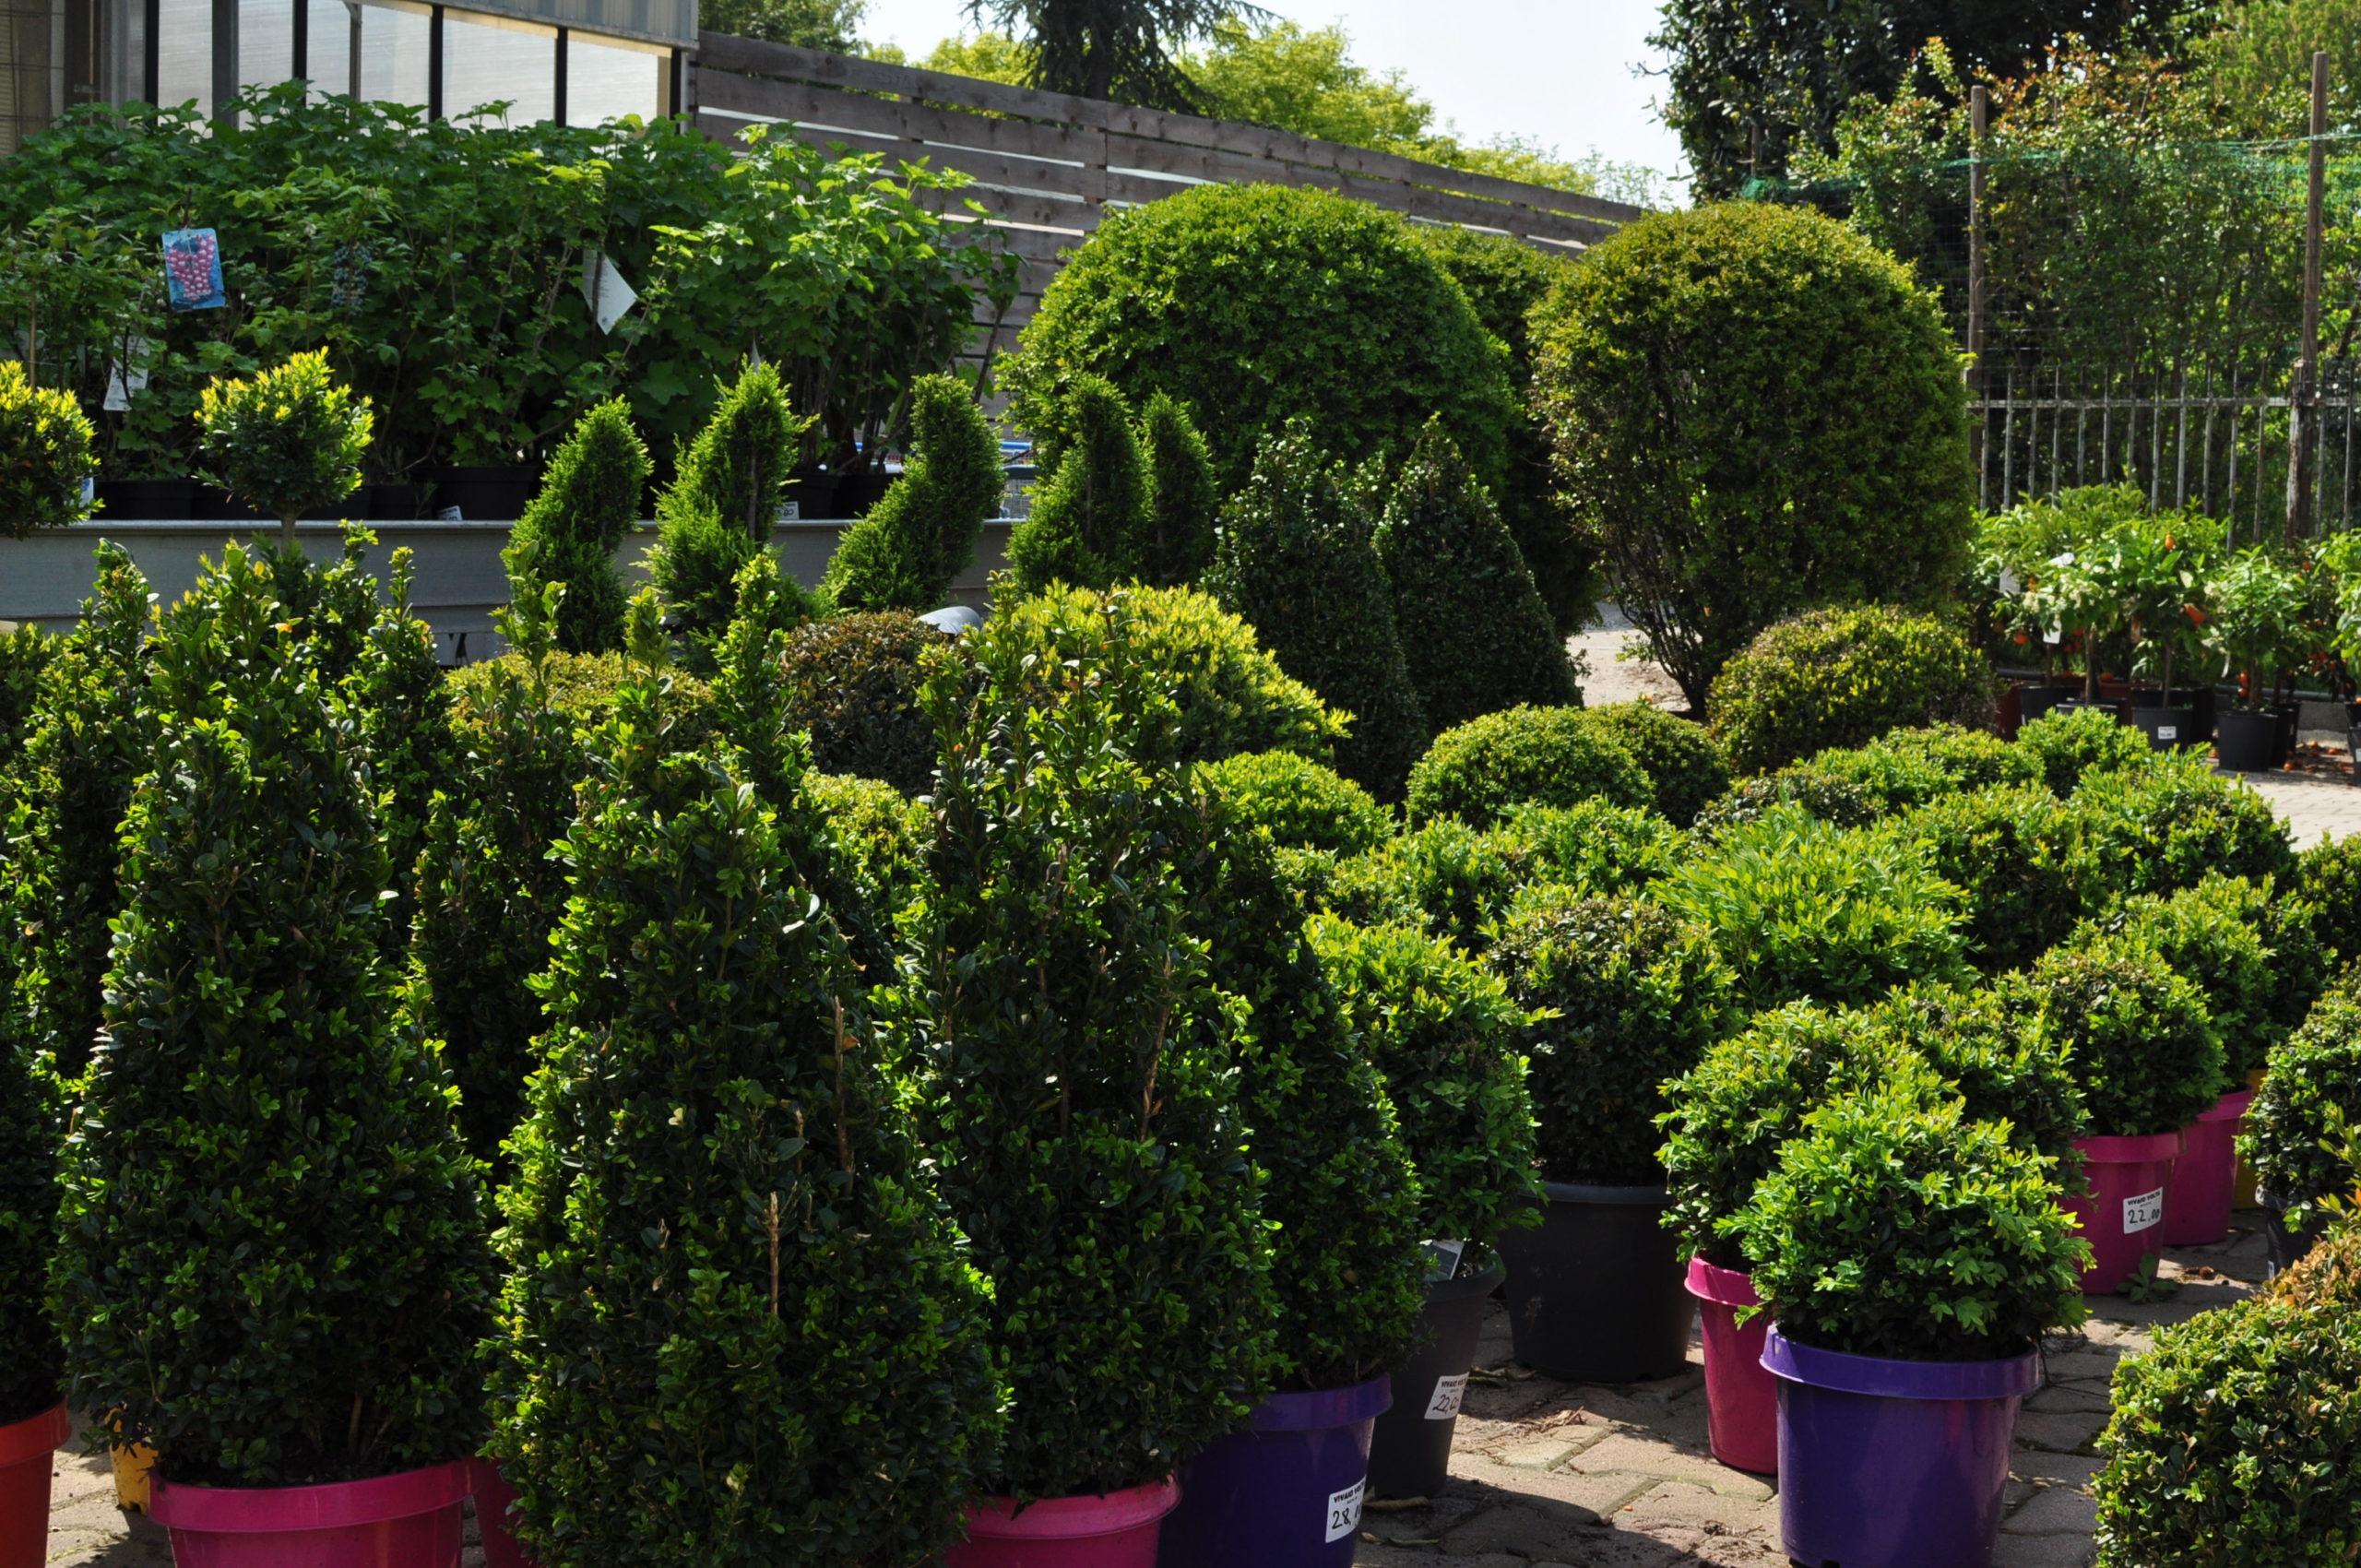 cespugli e siepi piante da esterno